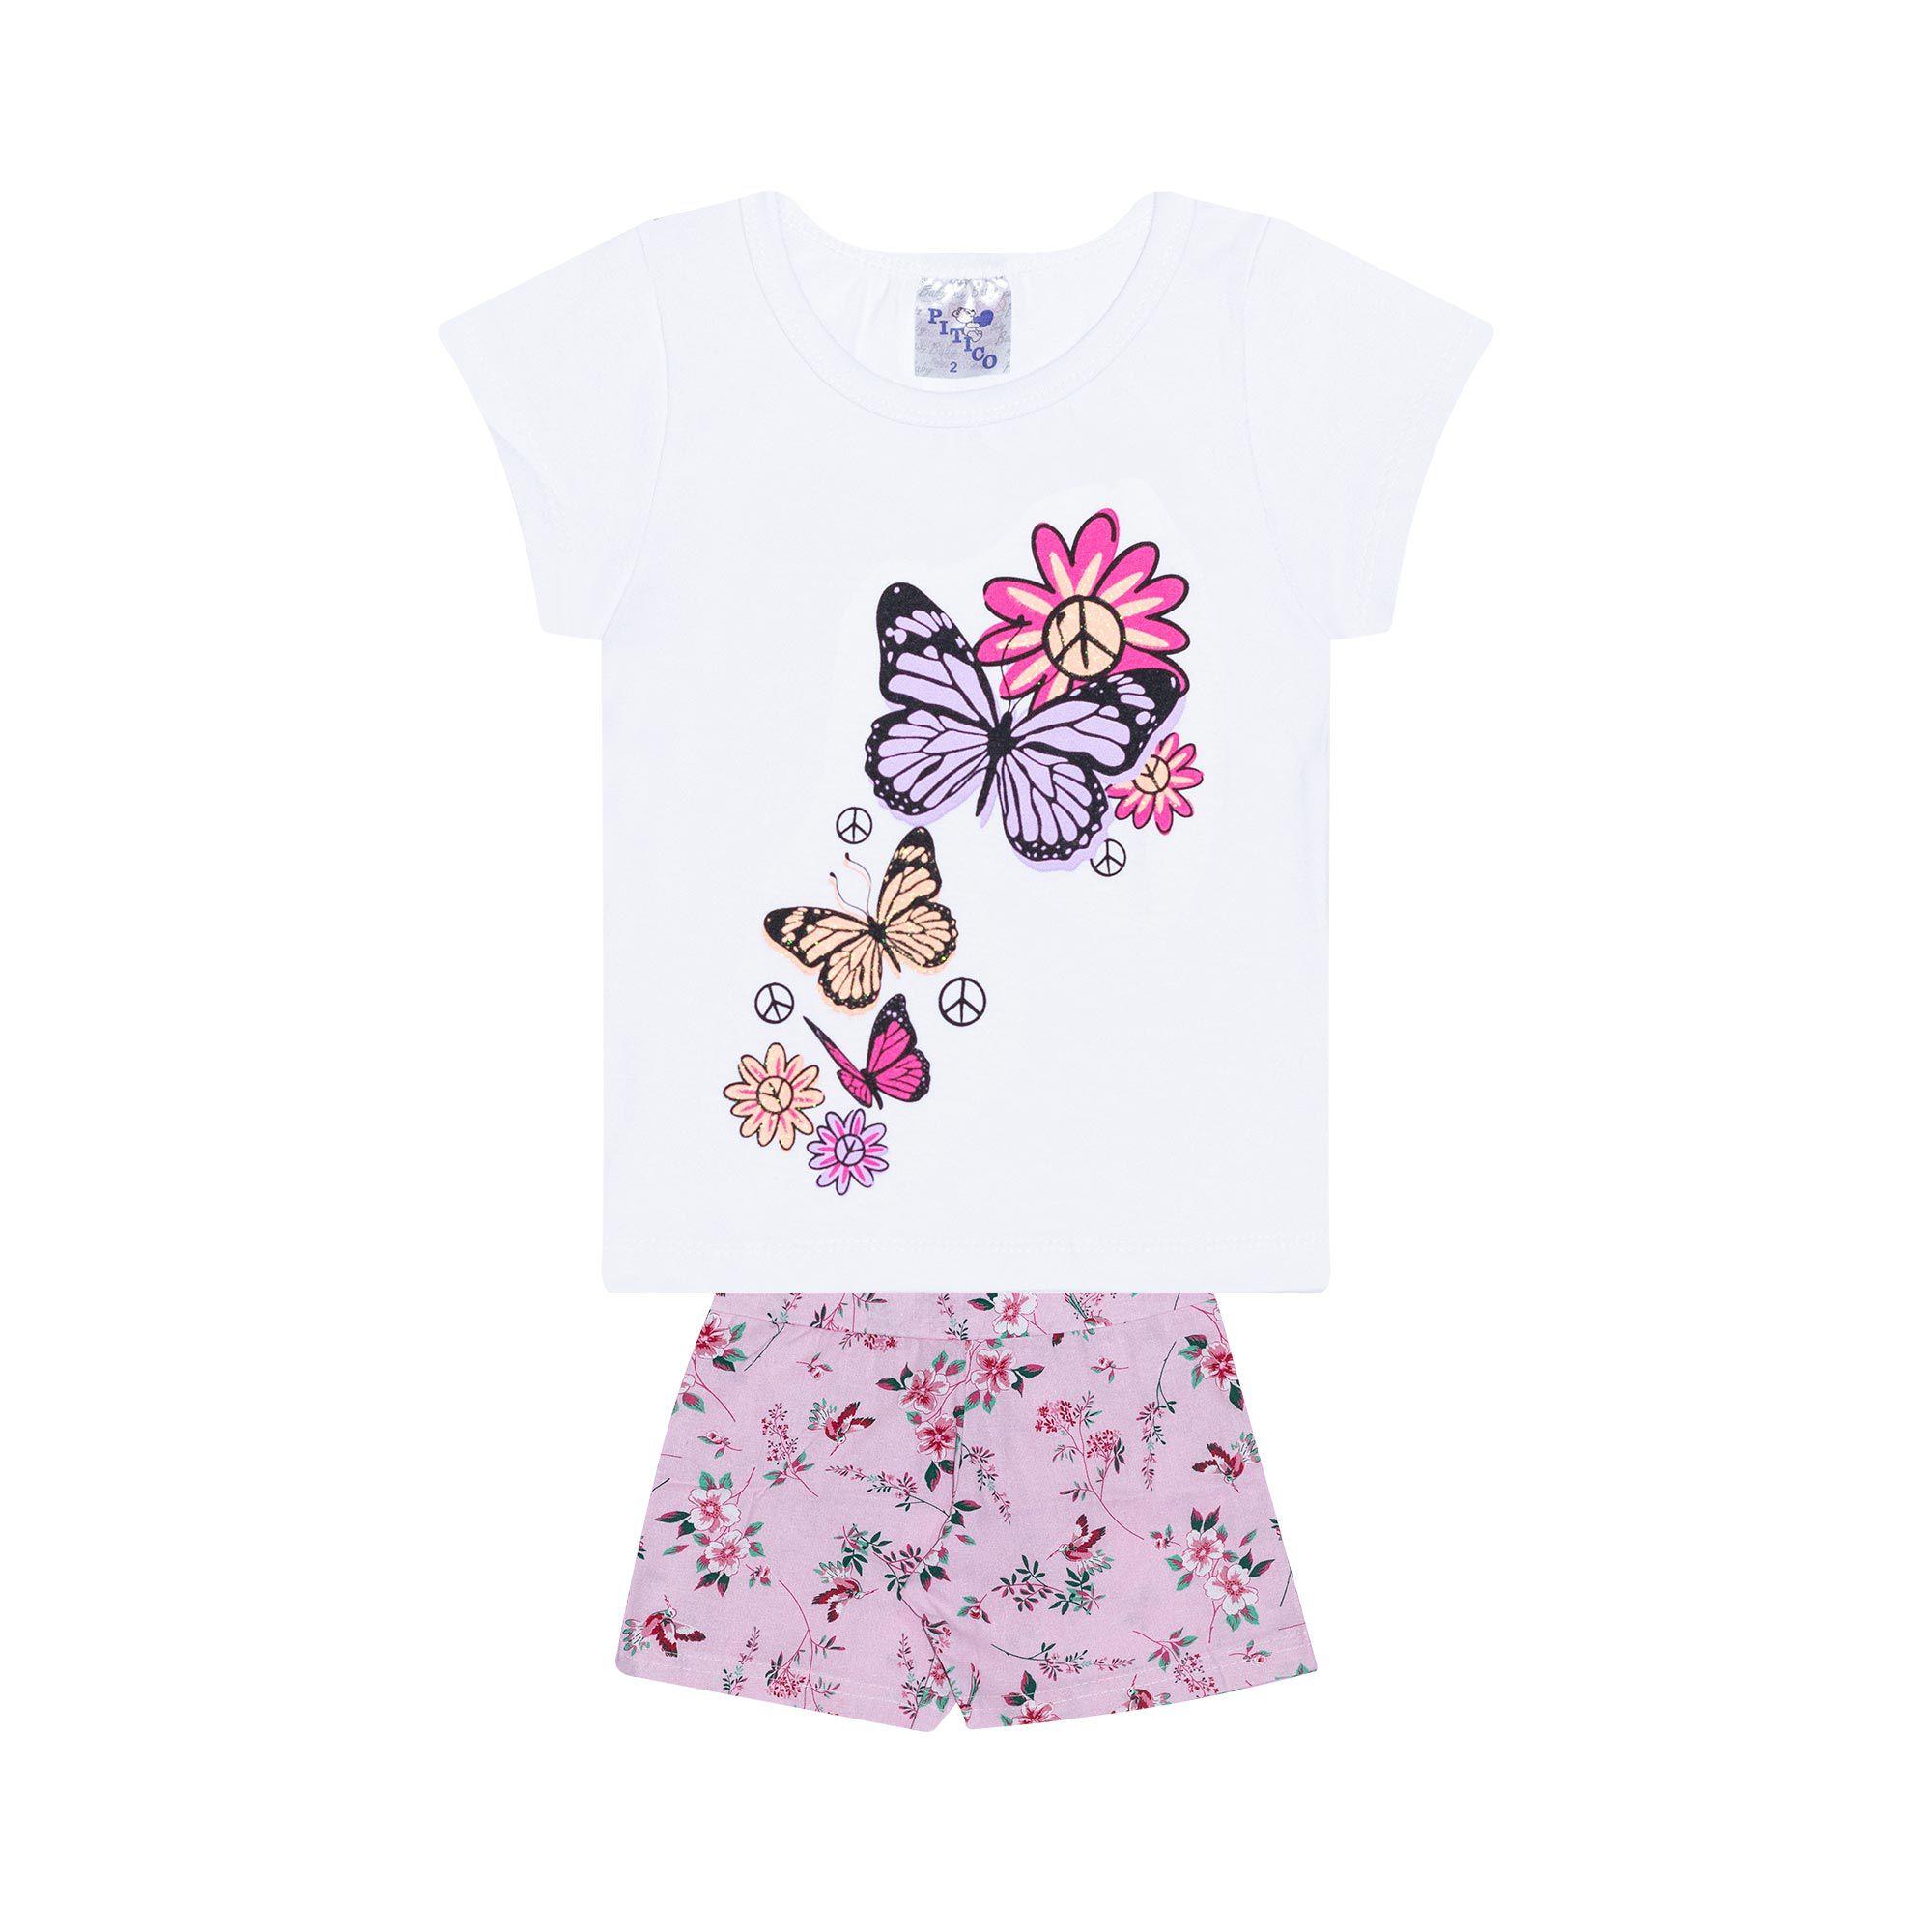 Conjunto Infantil Feminino - Ref 1002 - Branco/Rosa - Pitico